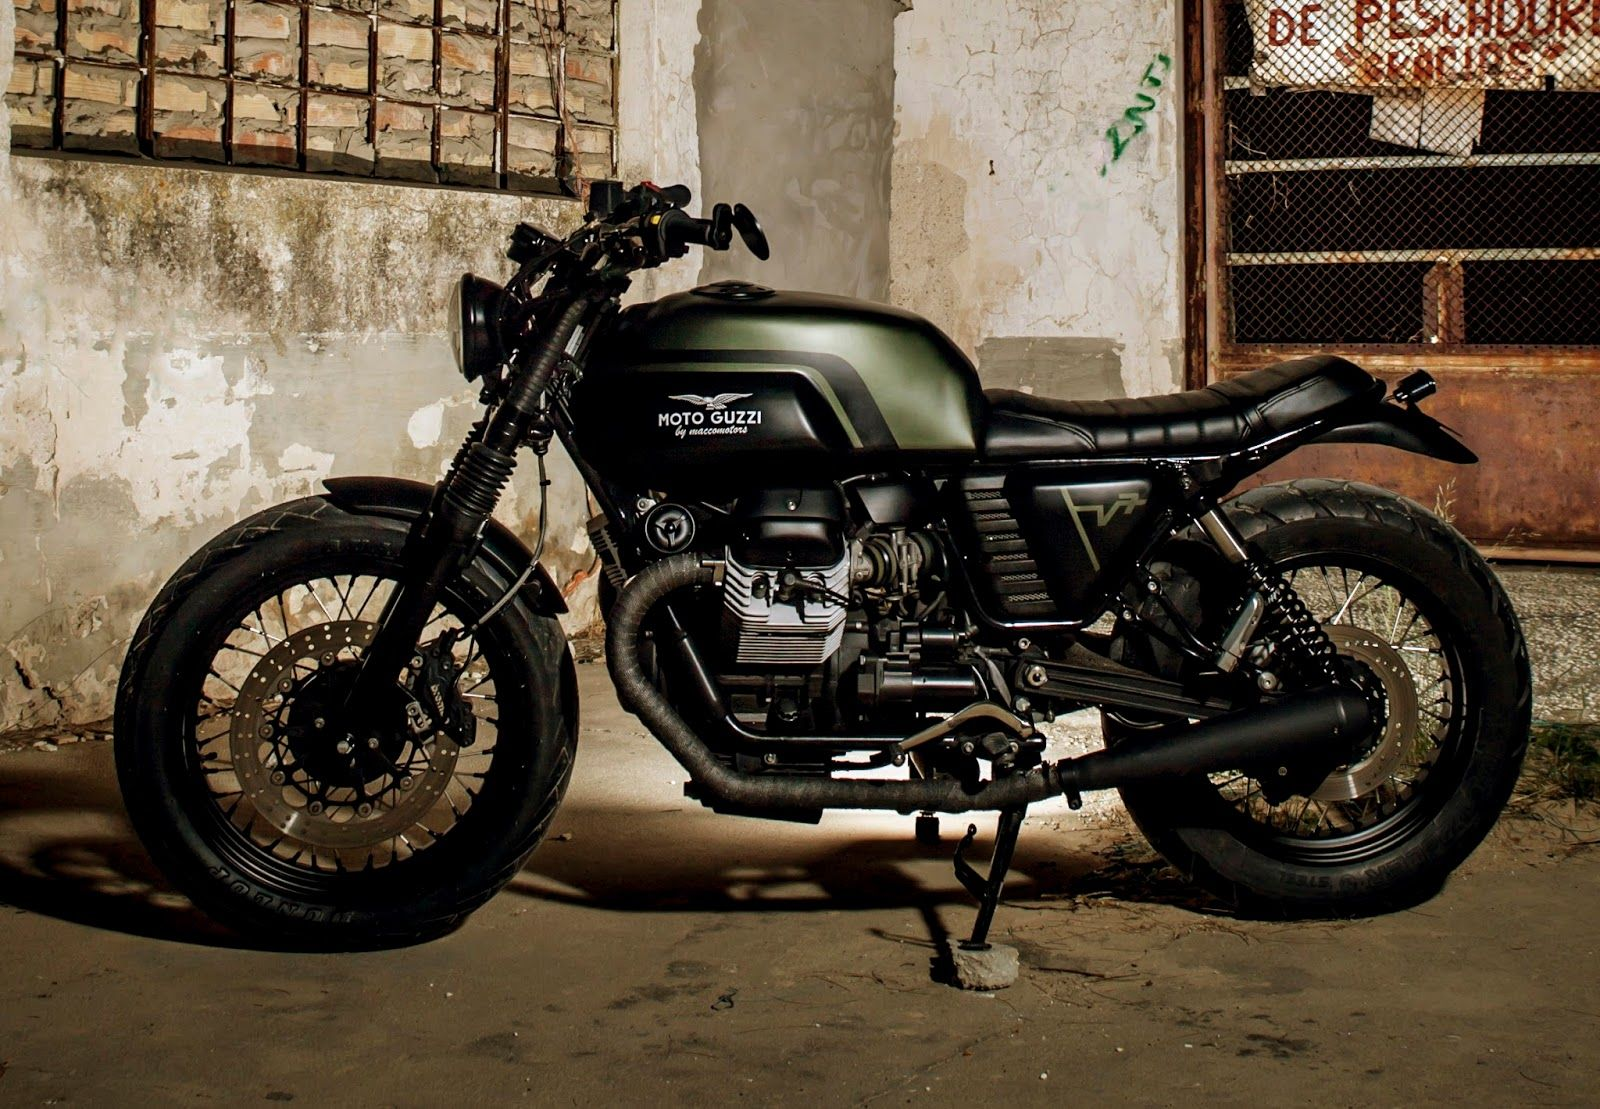 moto guzzi v7 classic by macco motors bike harley. Black Bedroom Furniture Sets. Home Design Ideas